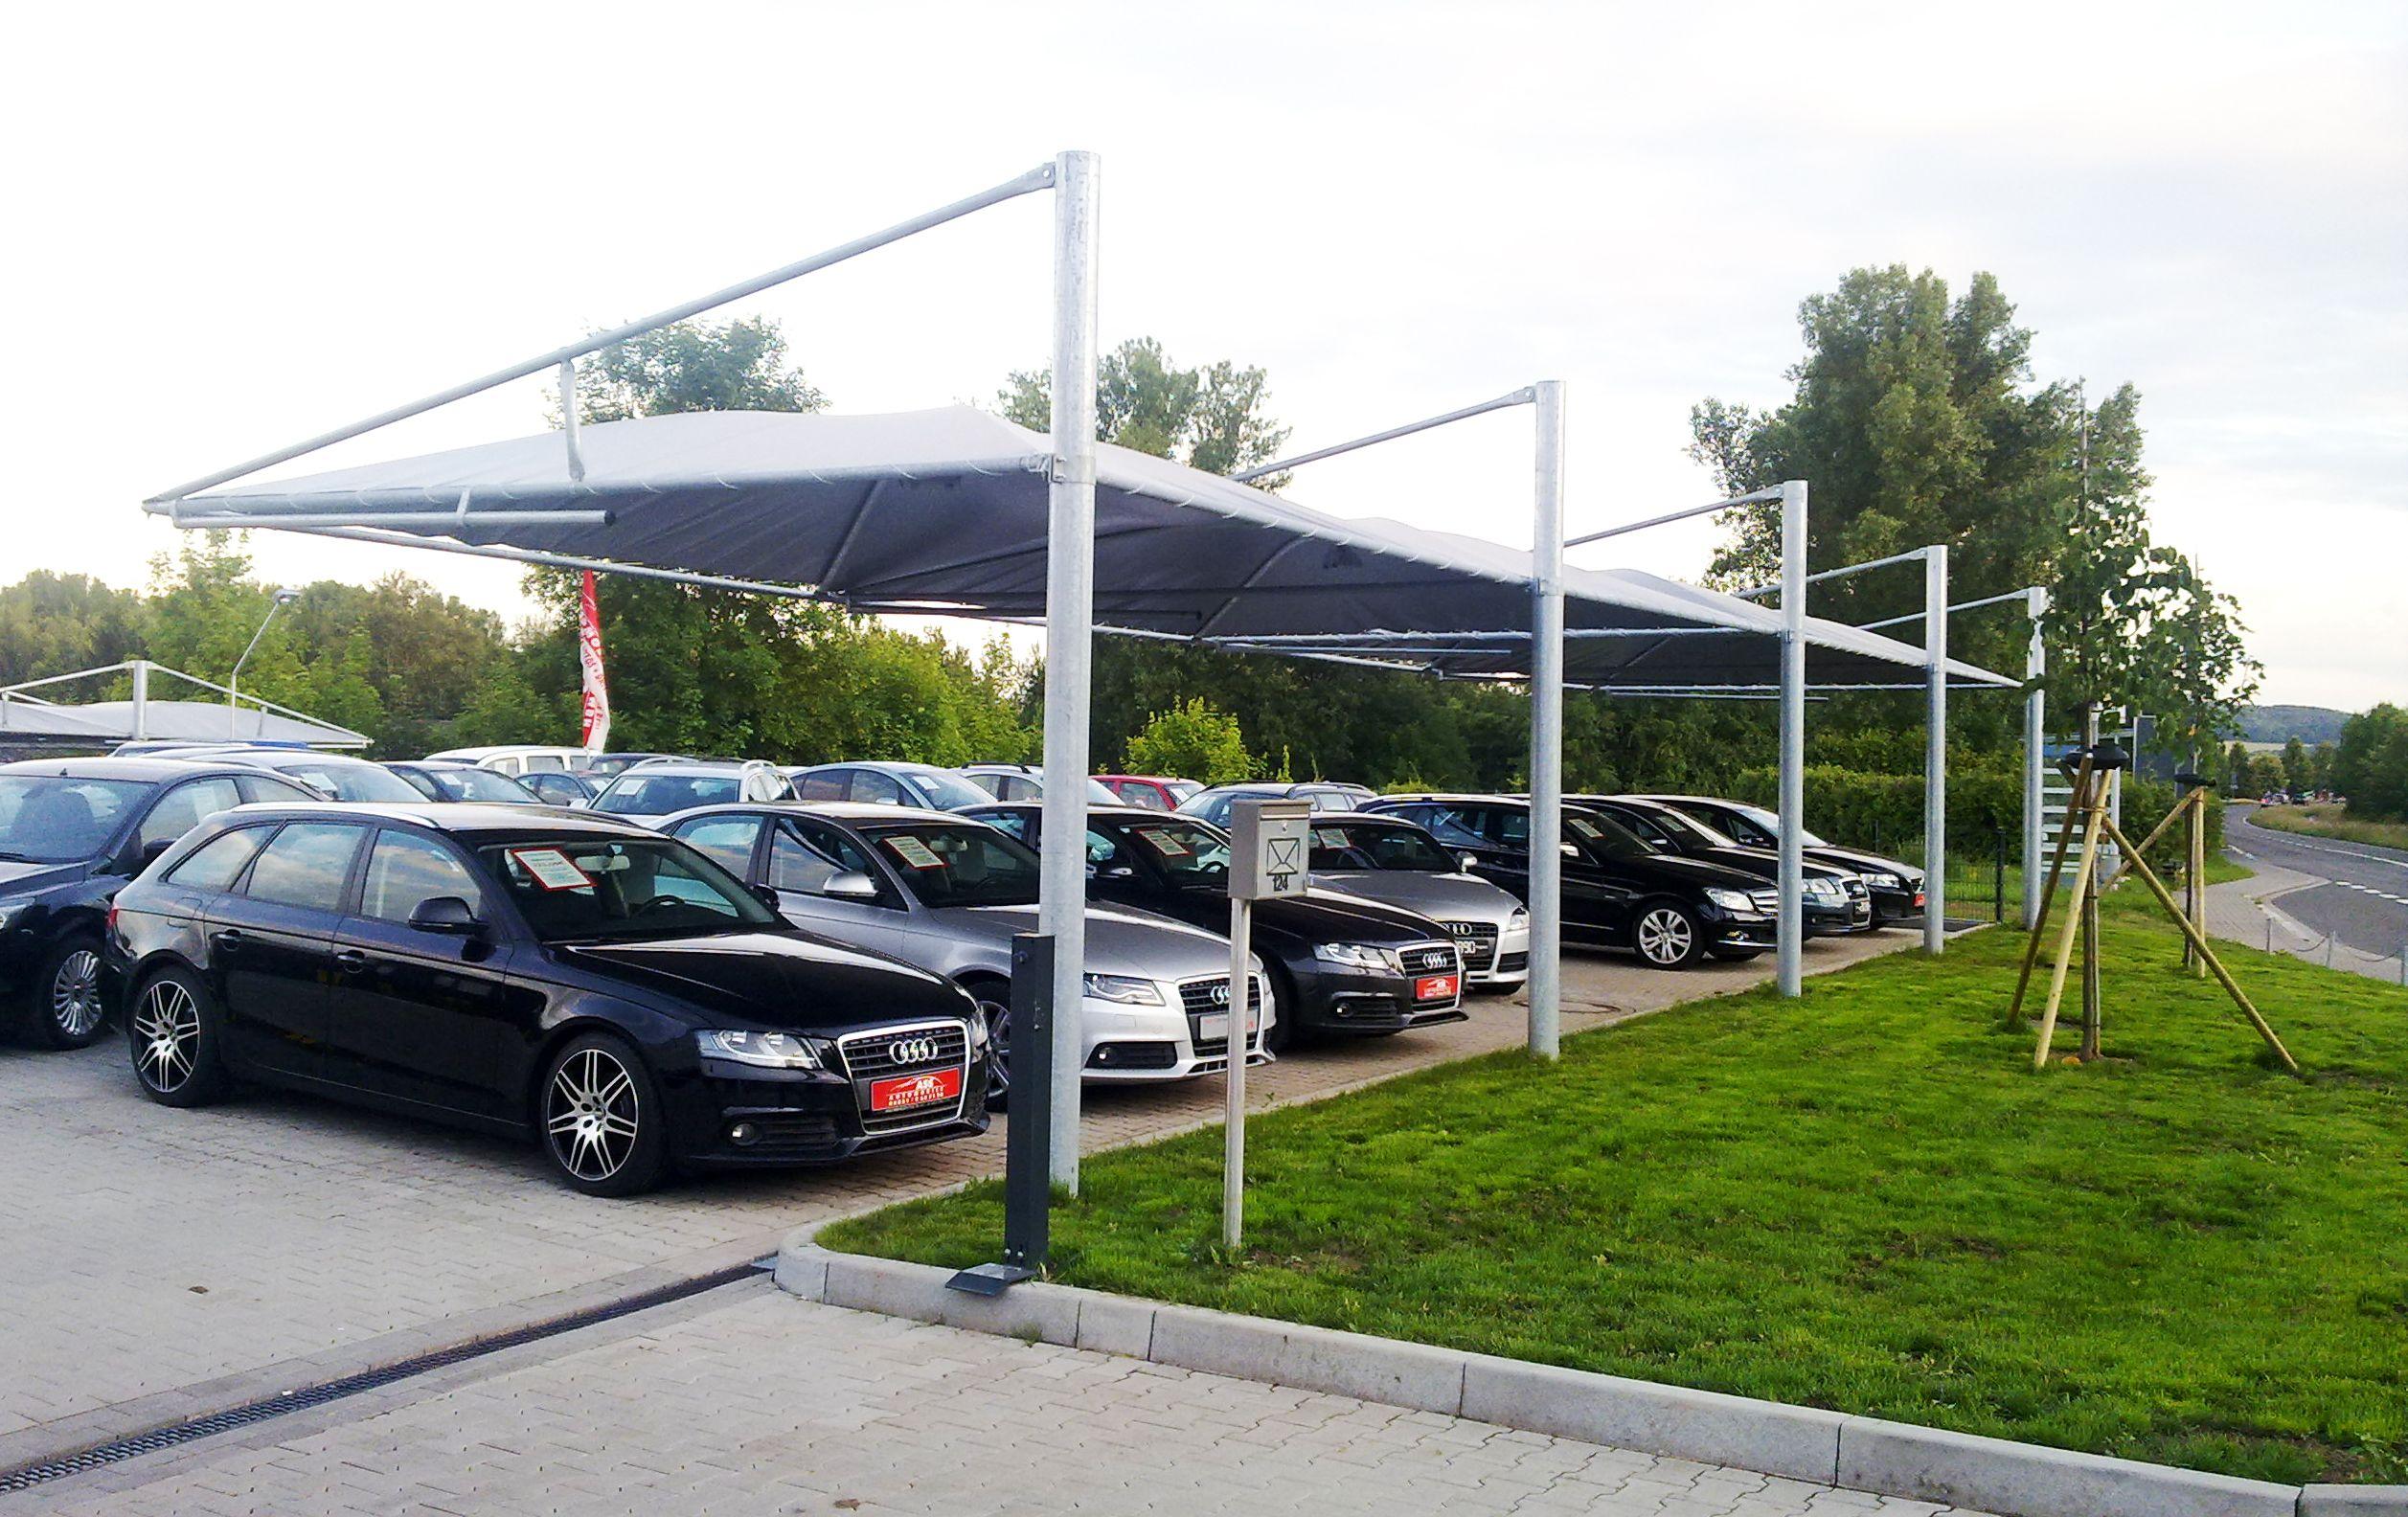 Carport kombination für mehrere parkplätze u ac inkl mwst